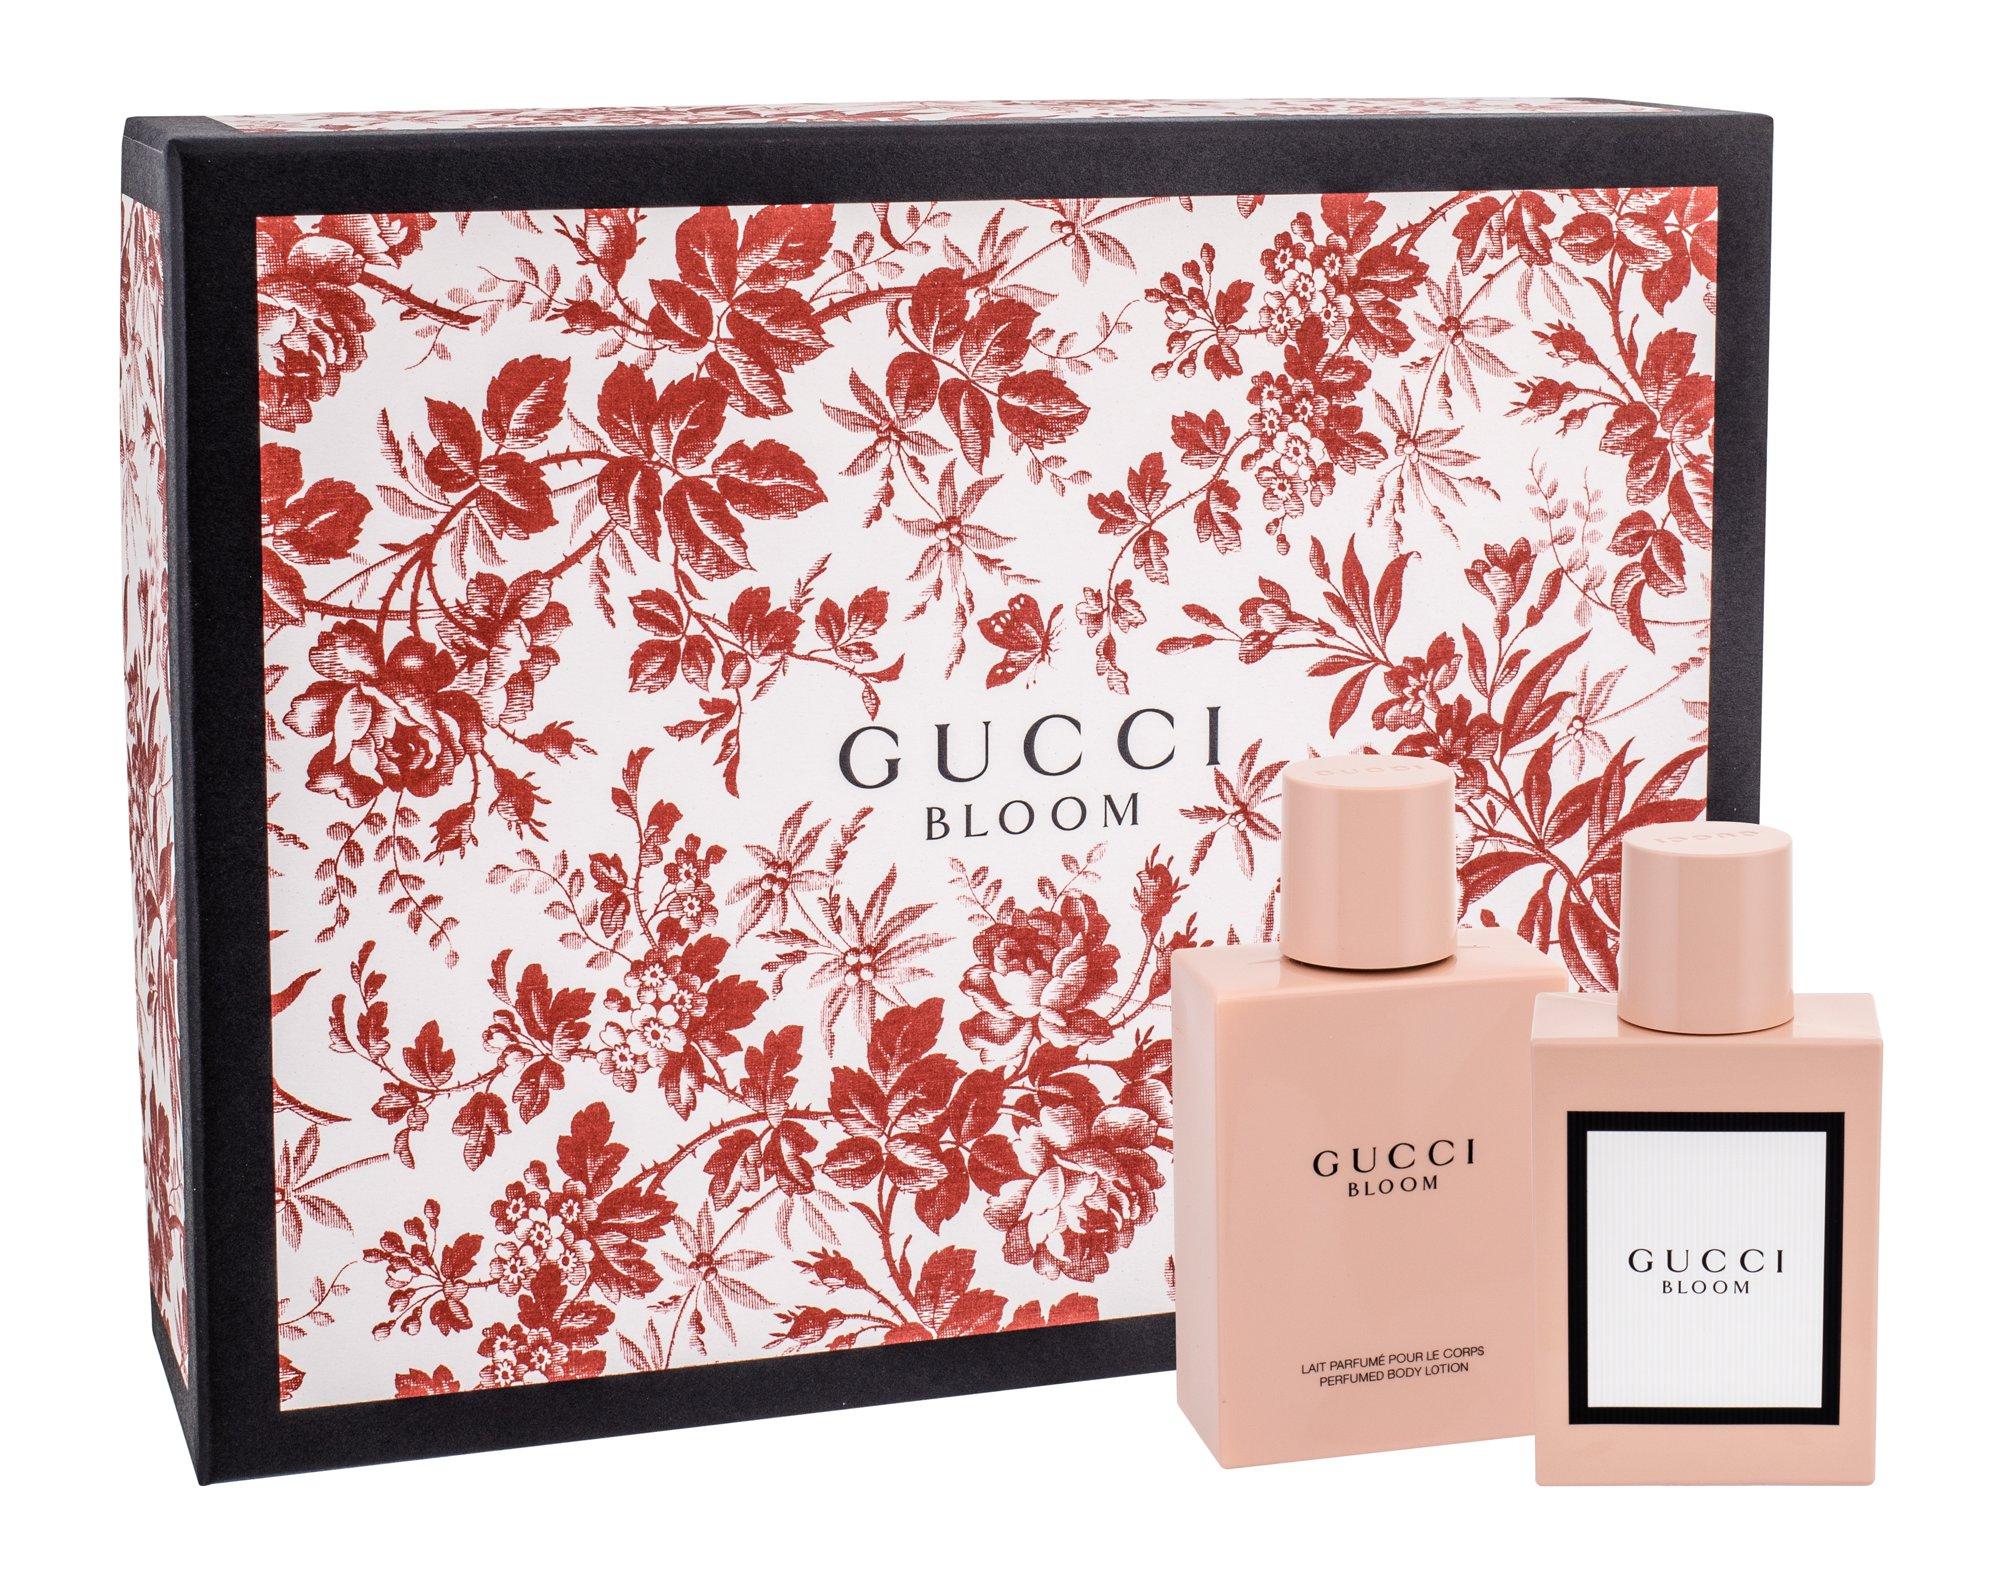 Gucci Bloom, parfumovaná voda 50 ml + Tělové mléko 100 ml